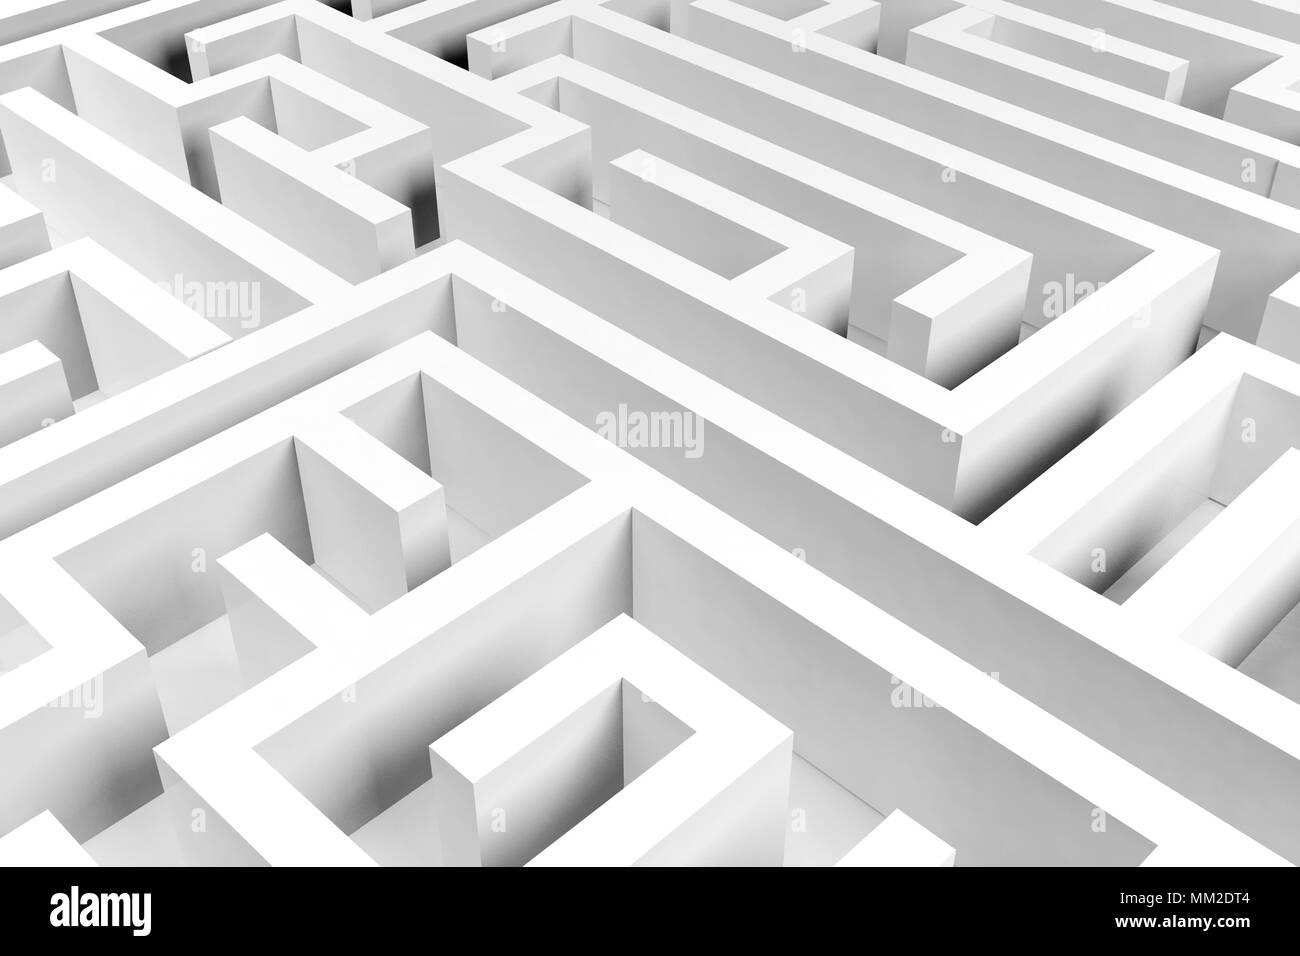 Maze background, complex problem solving concept Stock Photo